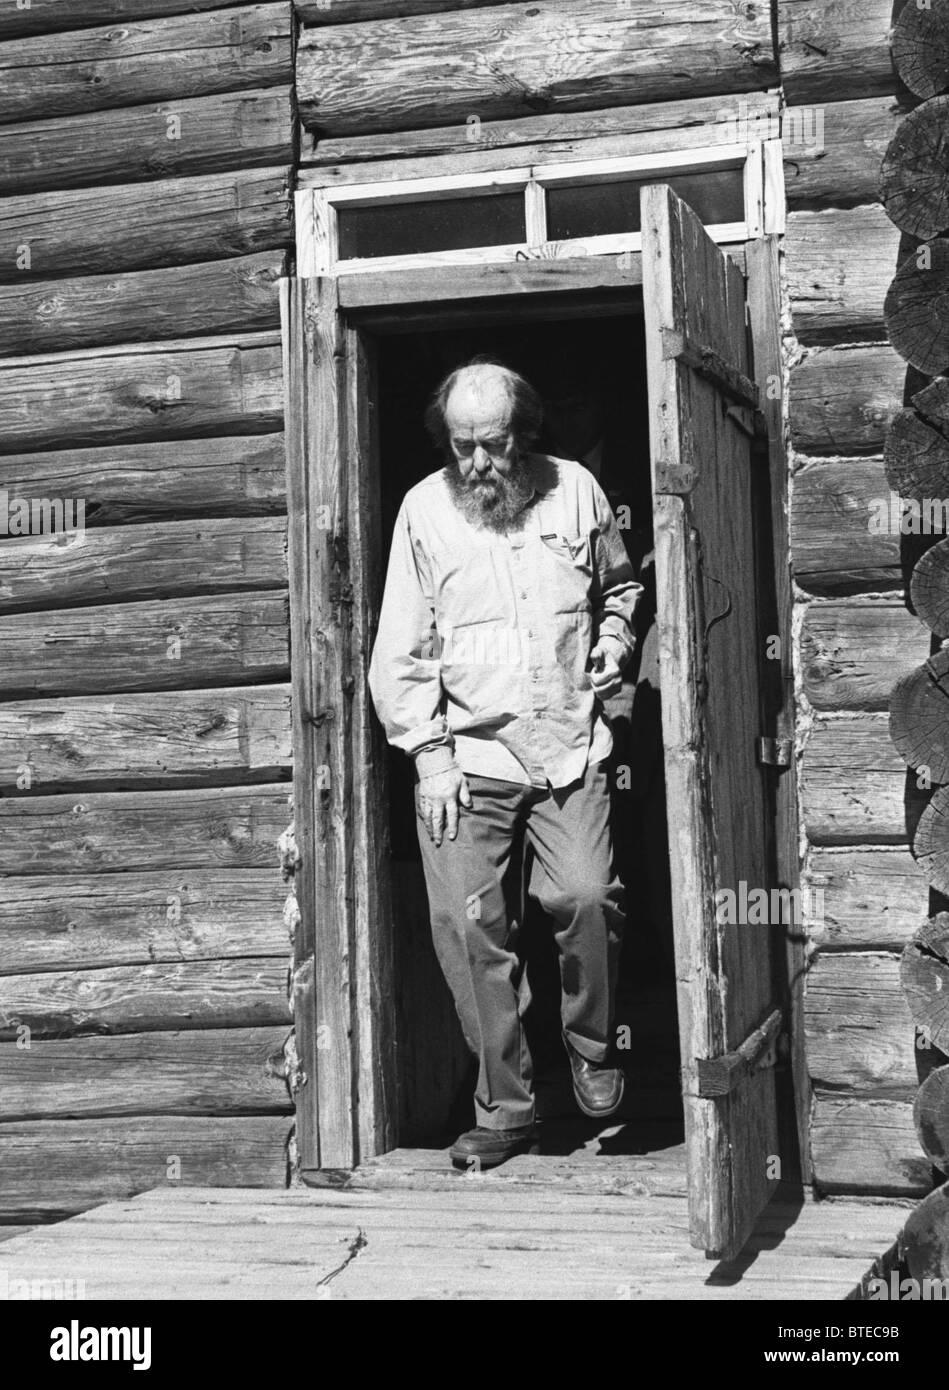 Russian writer Alexander Solzhenitsyn visits Matryona Zakharova's house, 1994 Stock Photo